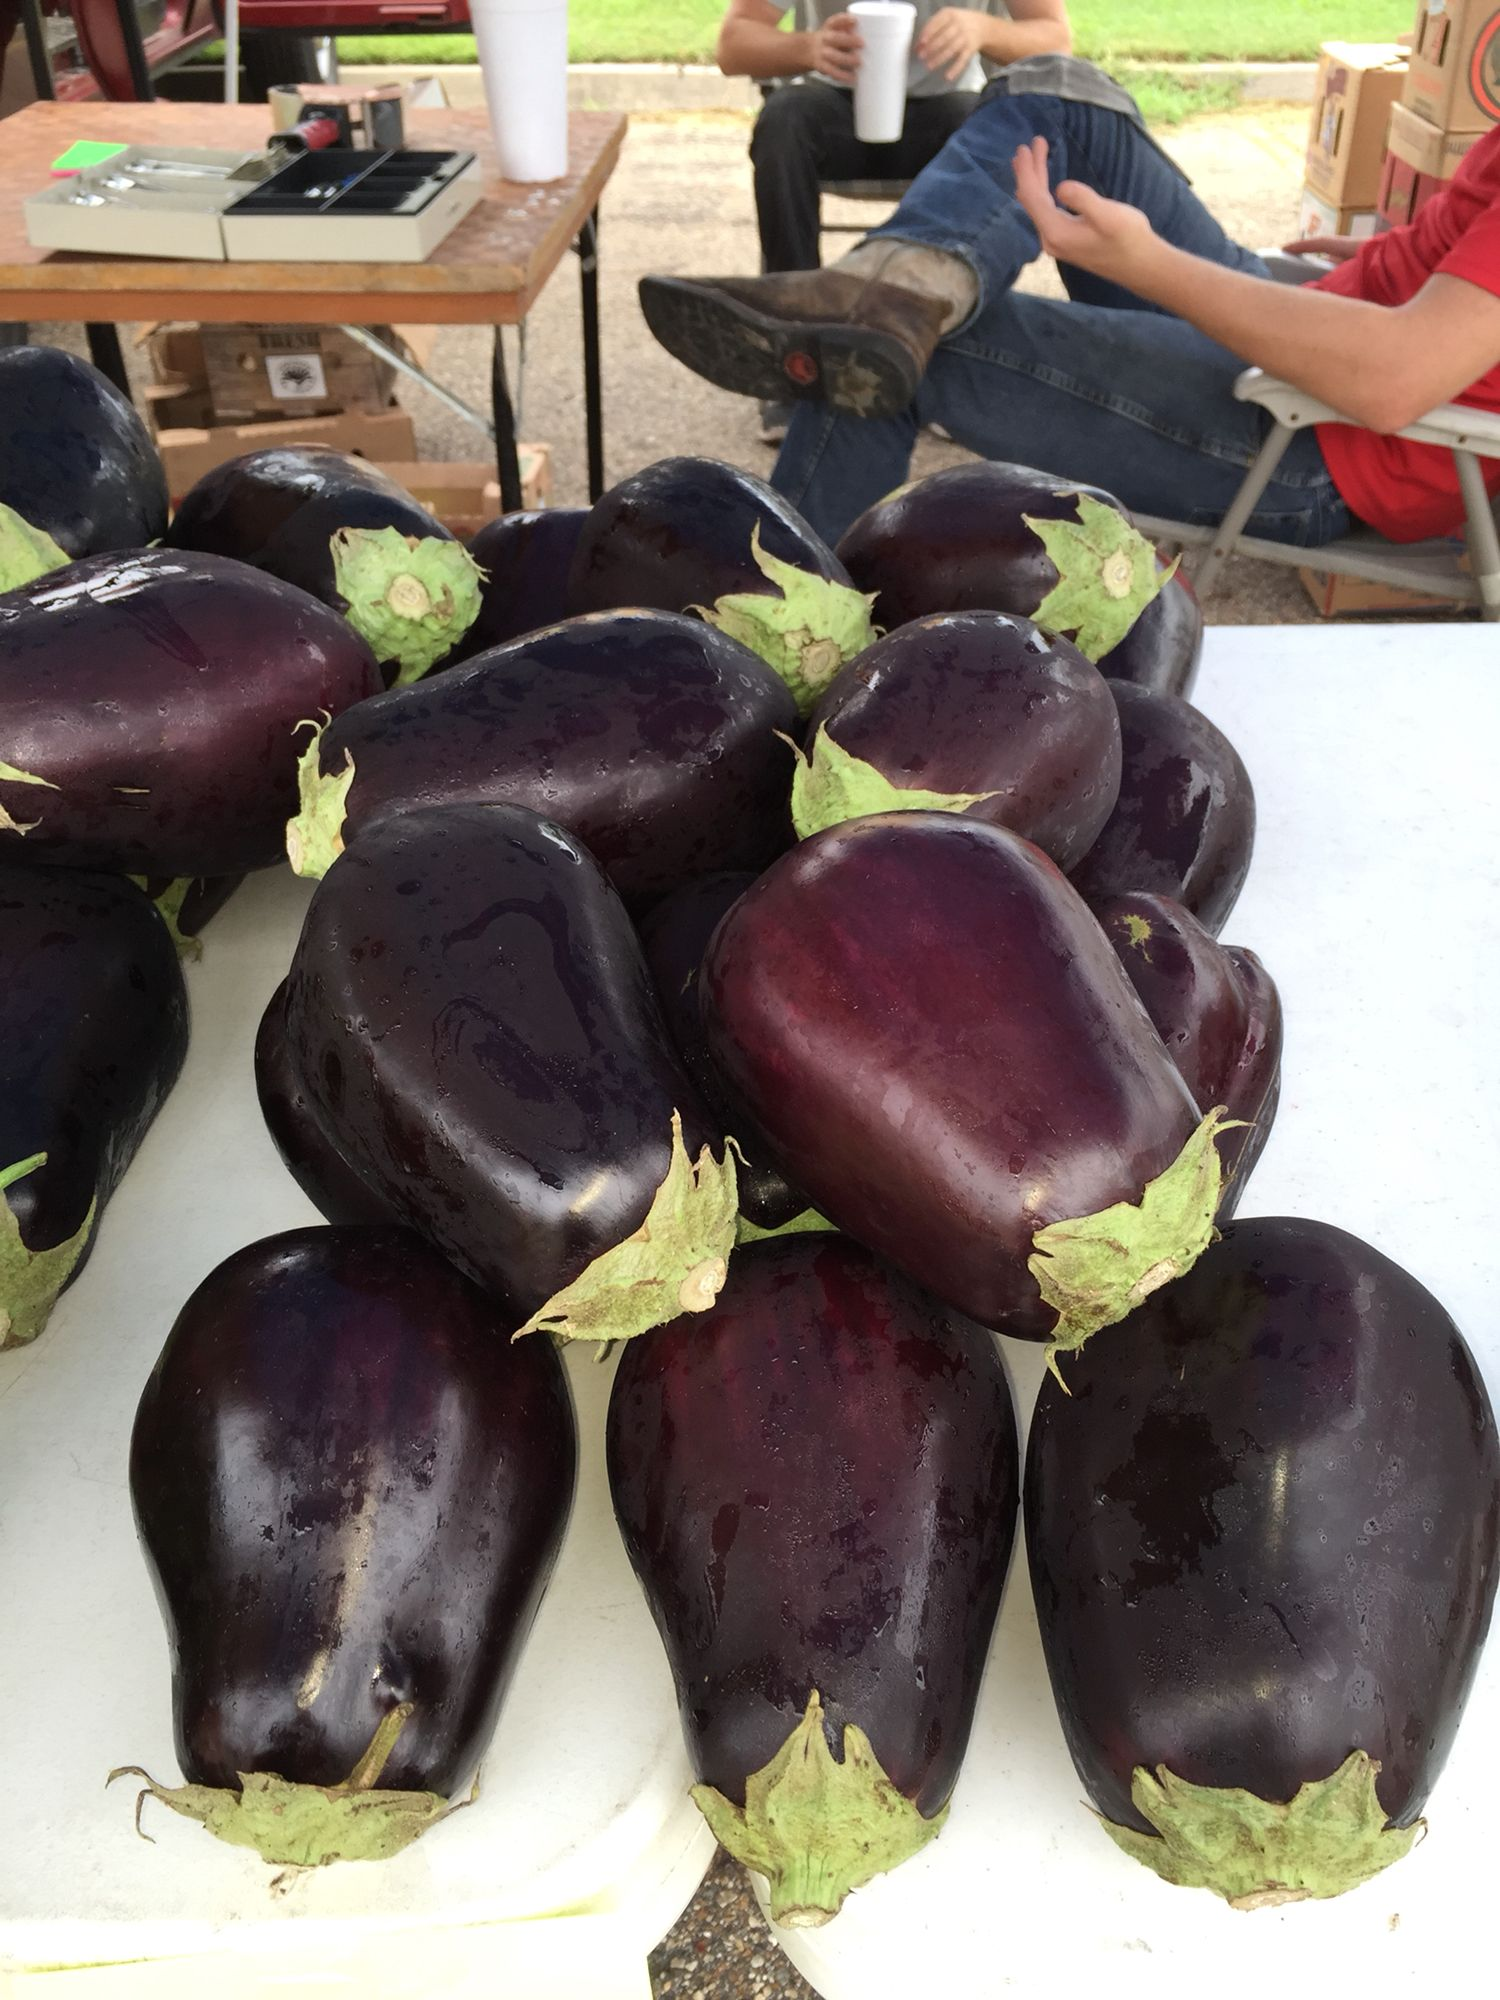 Eggplant from Macs. Ruston Farmers Market